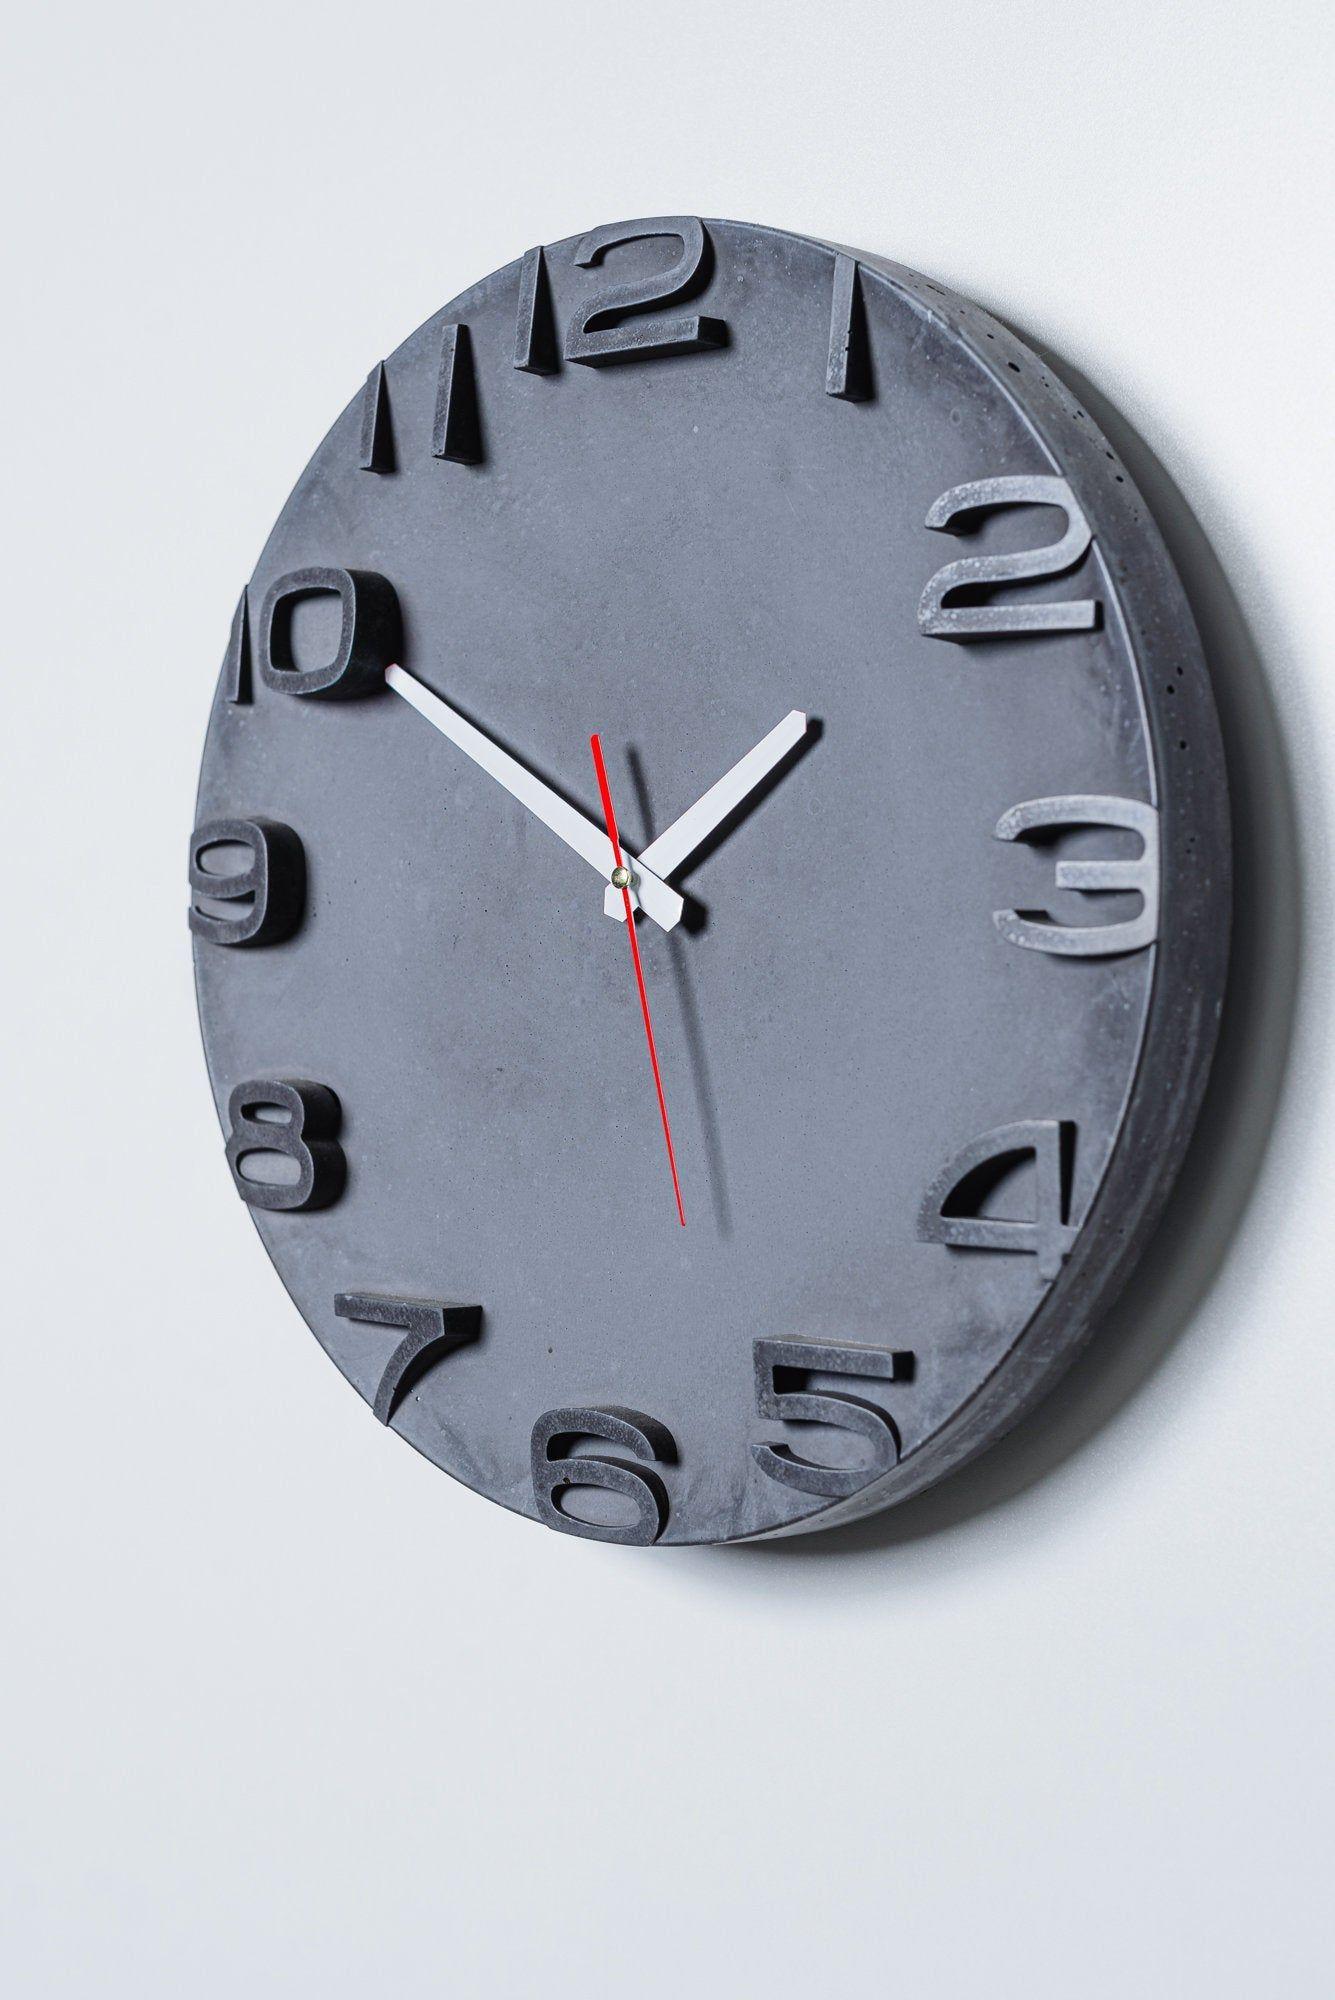 Modern Concrete Wall Clock Concrete Home Decor Industrial Wall Clock Modern Minimalist Decor In 2020 Industrial Clock Wall Wall Clock Modern Wall Clock